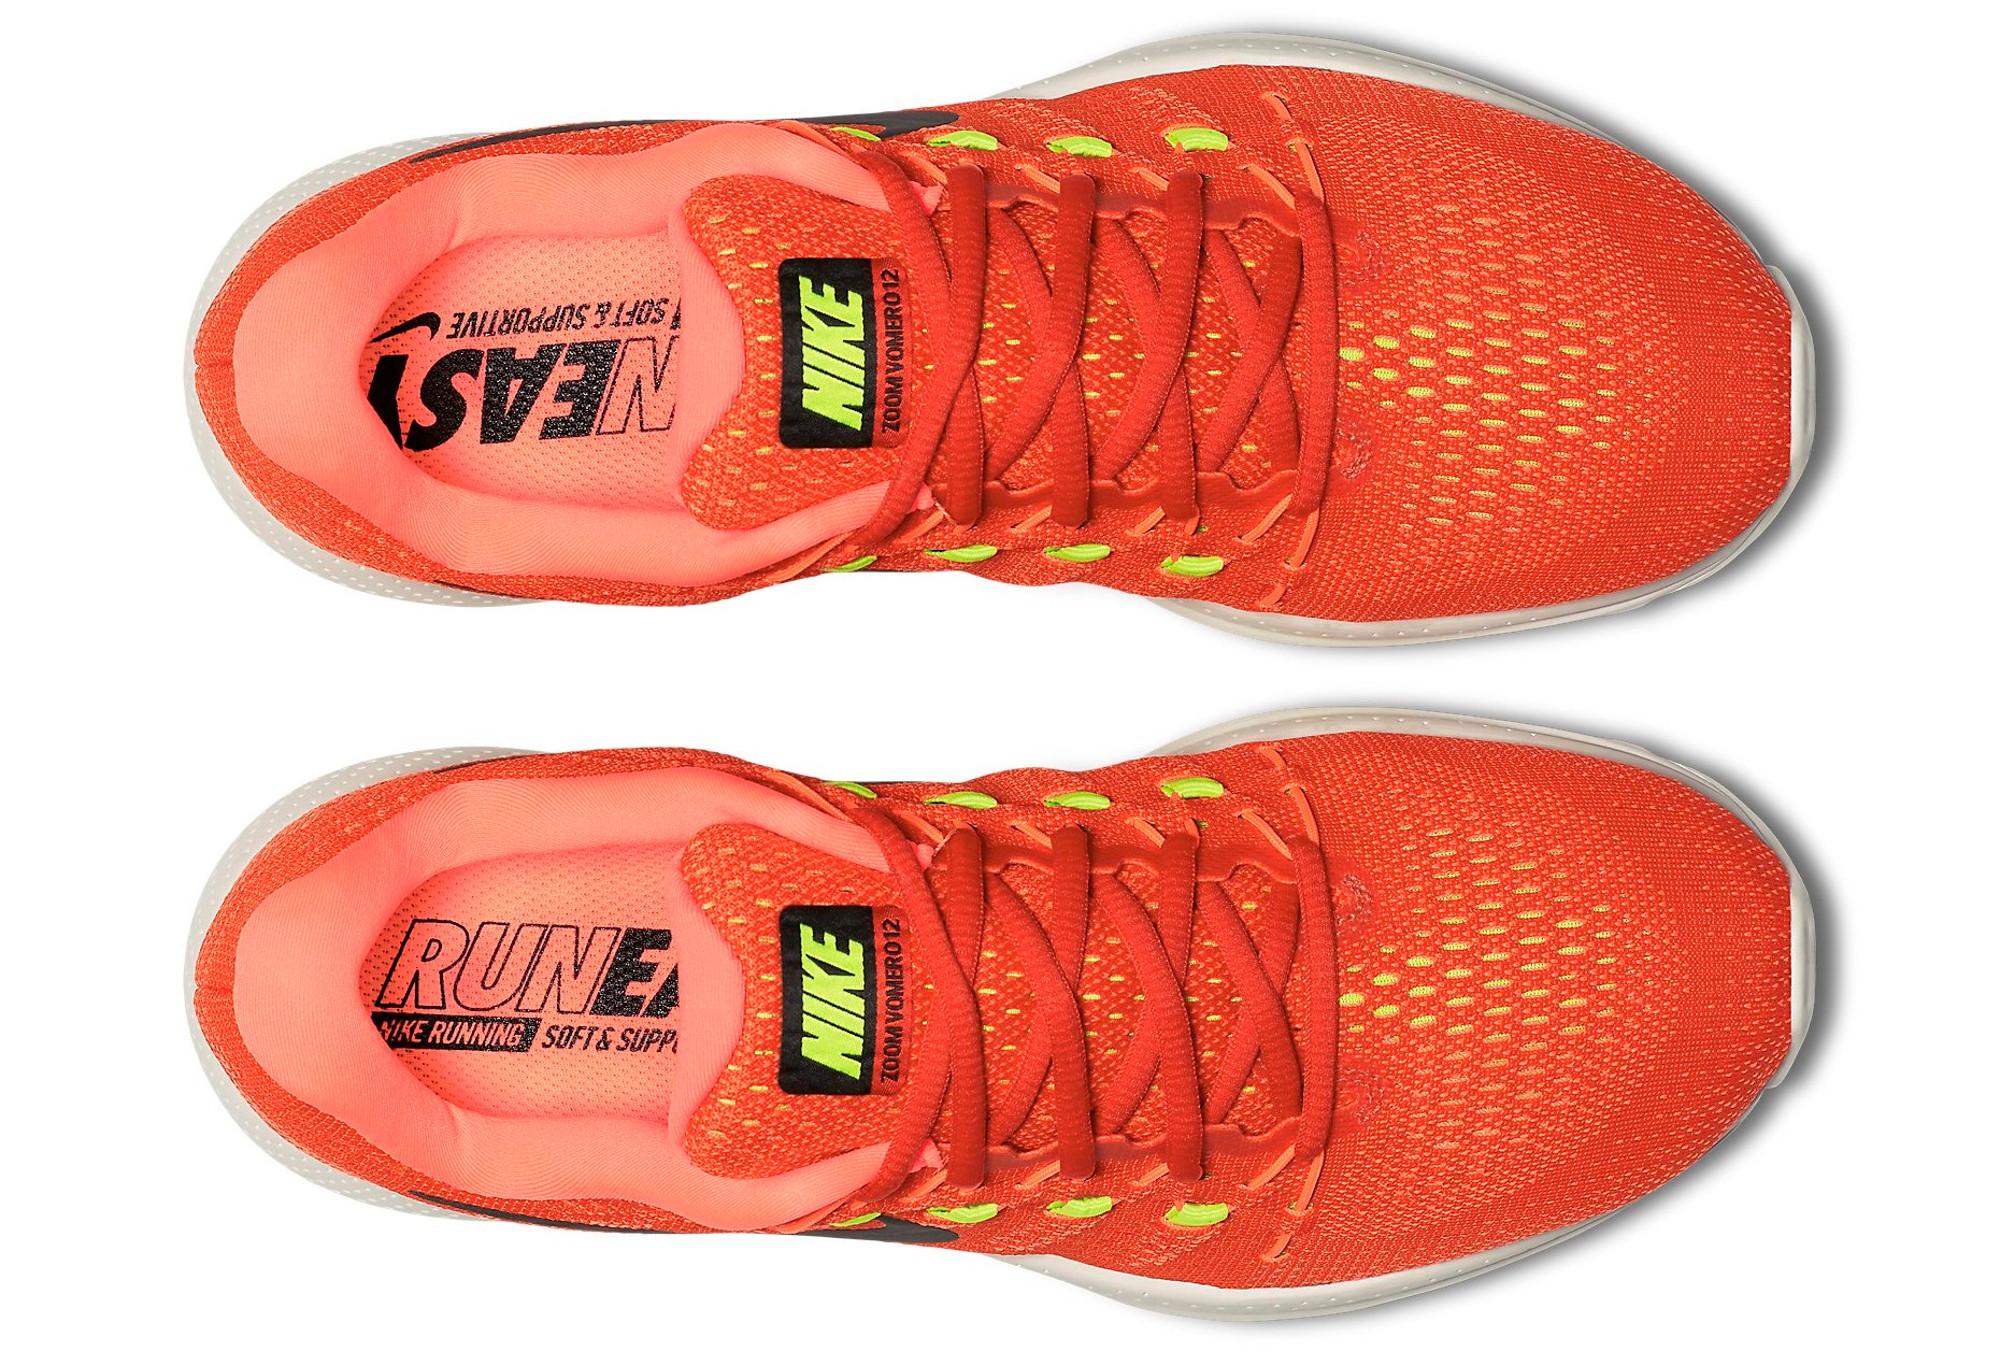 a6eaf170077d9 Chaussures de Running Nike AIR ZOOM VOMERO 12 Orange